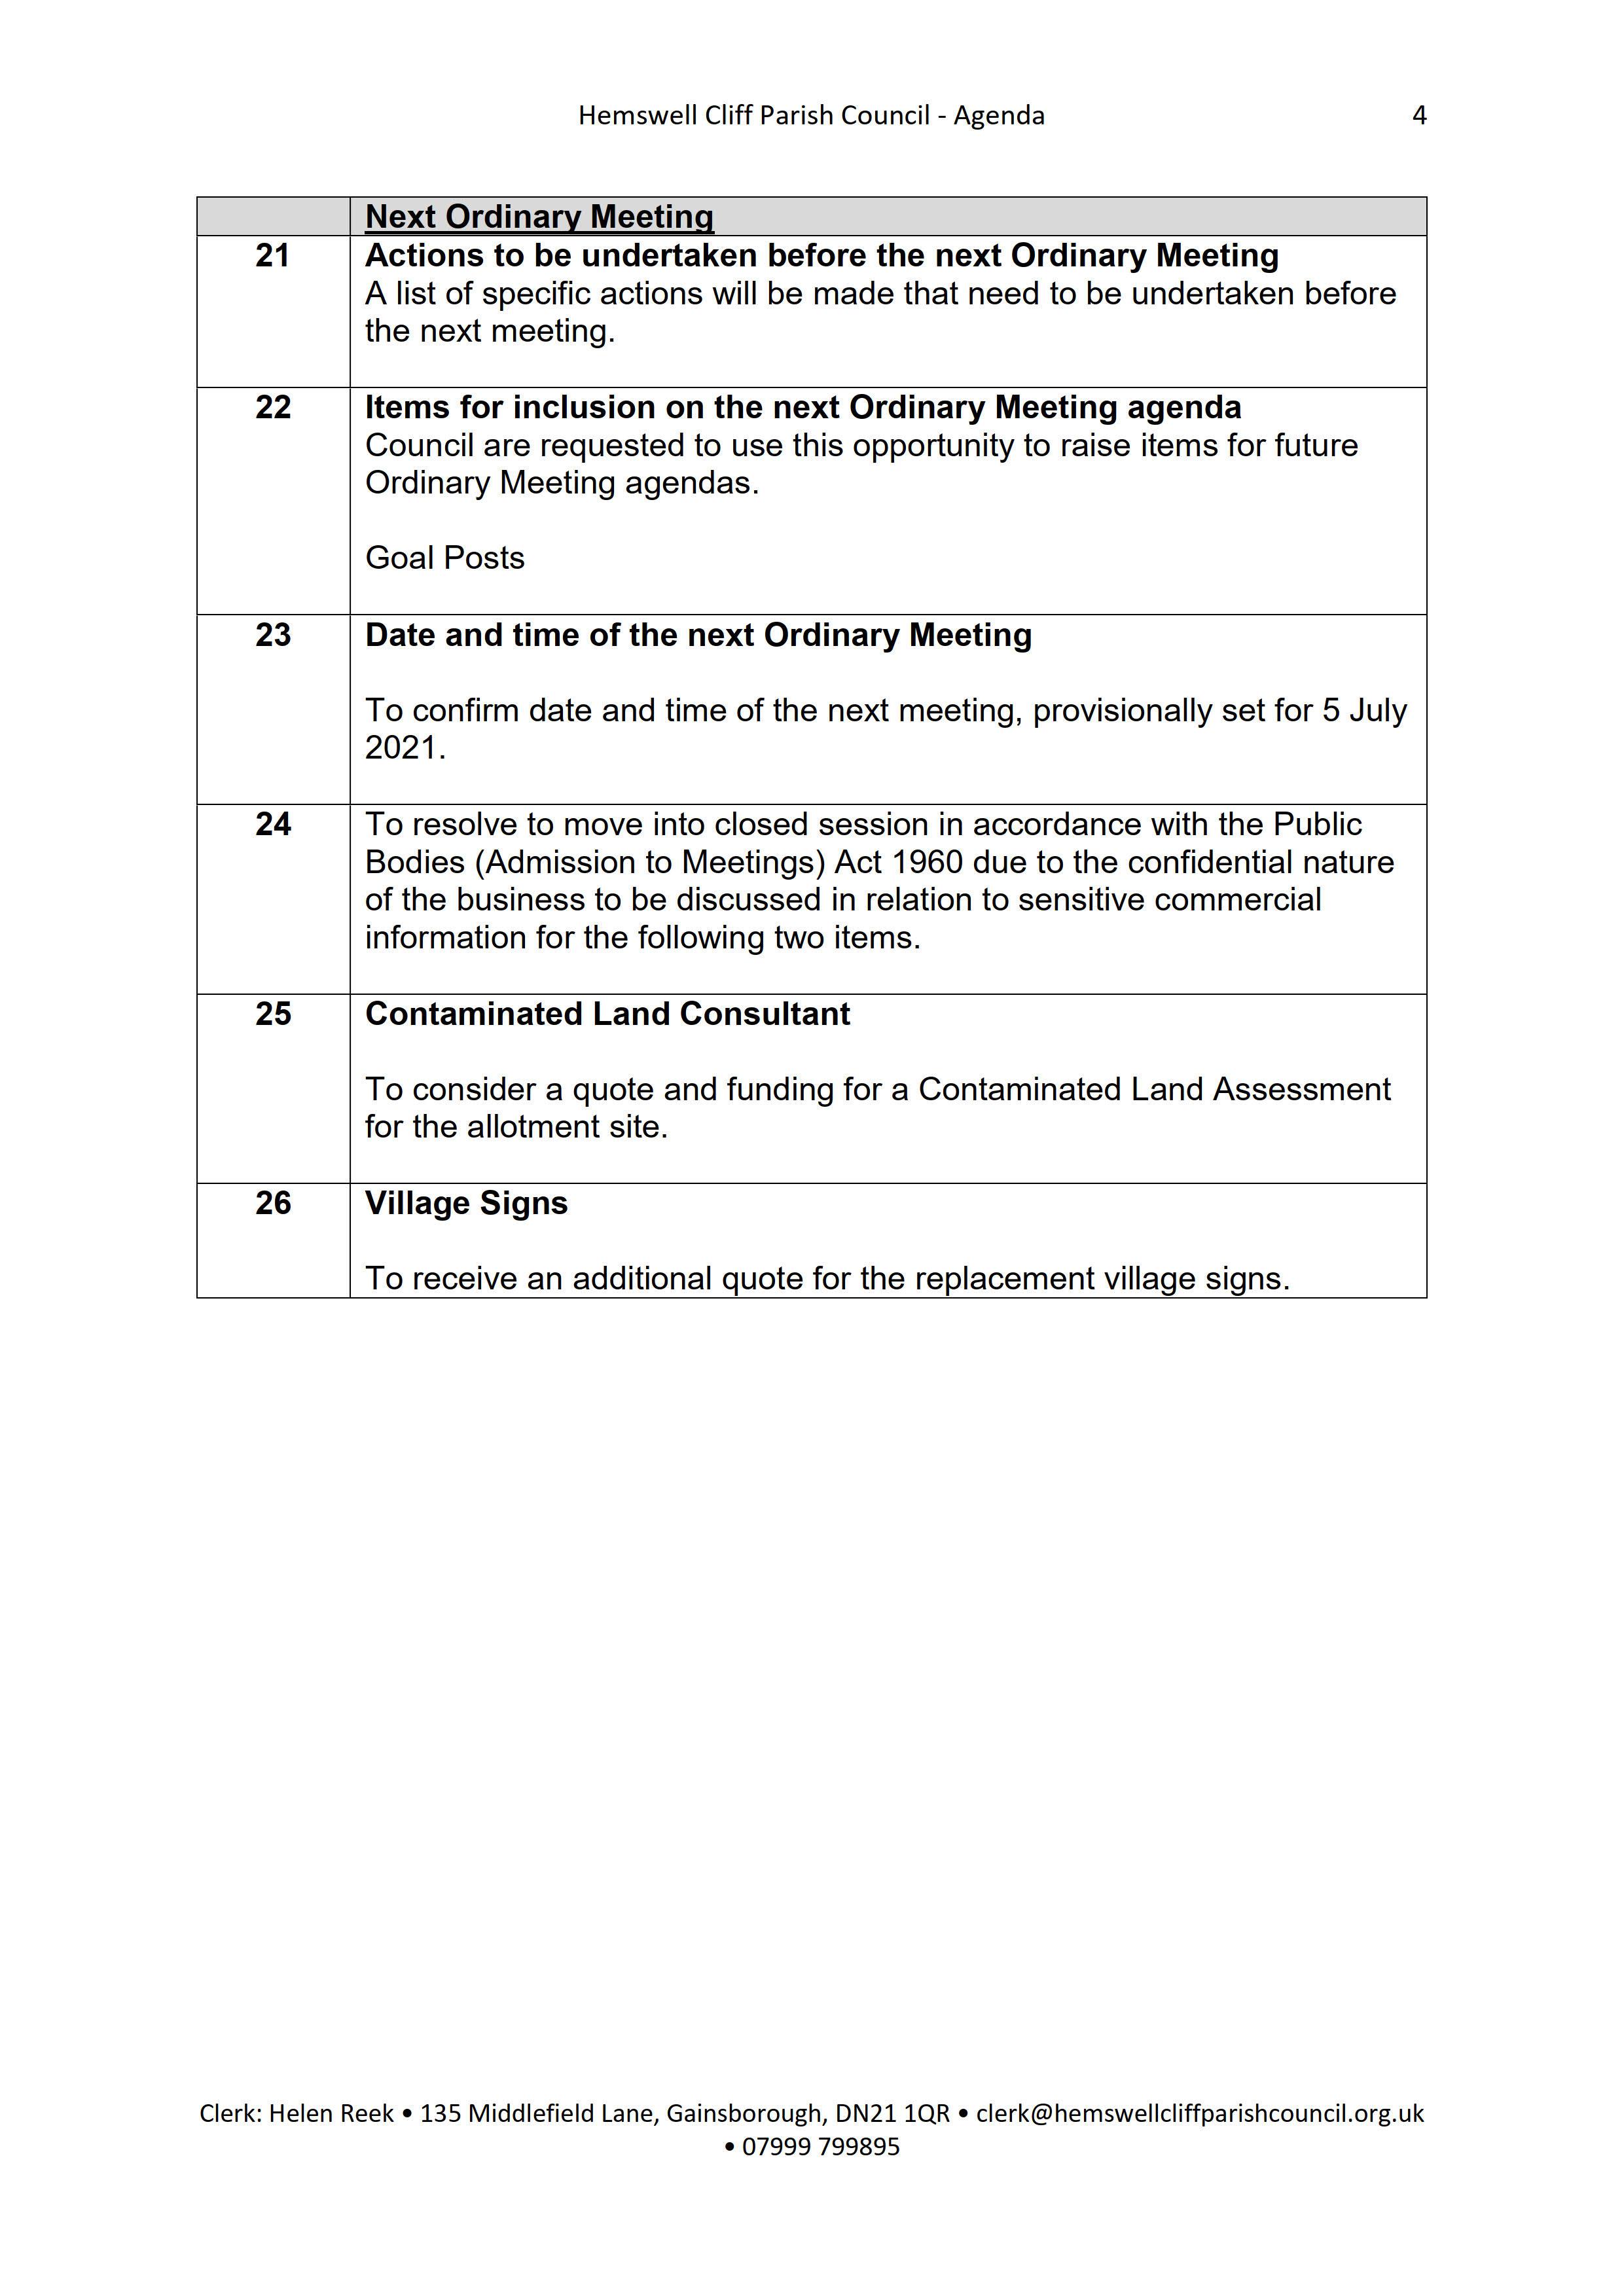 HCPC_Agenda_07.06.21_4.jpg